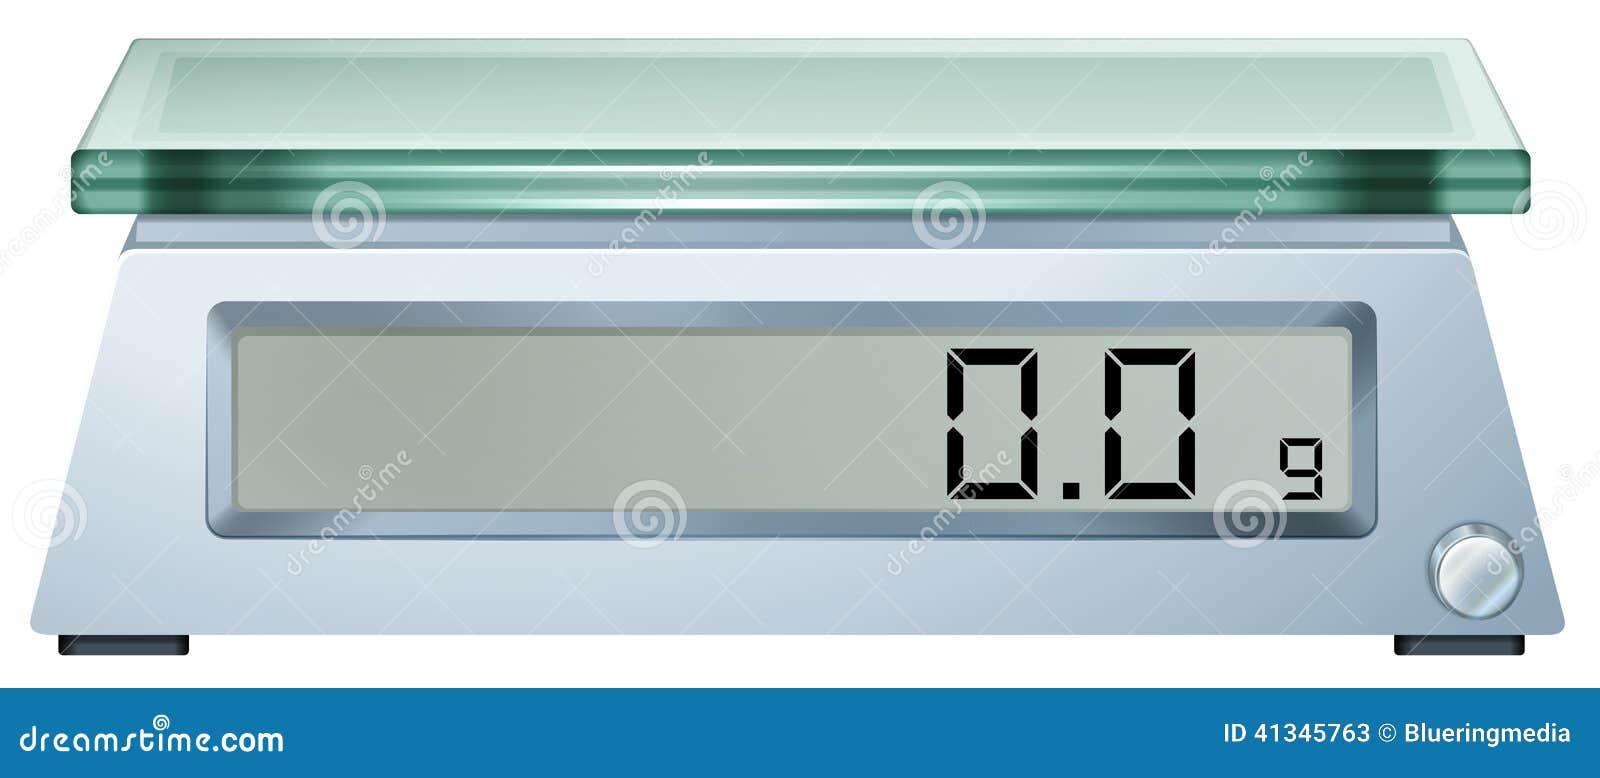 Electric Scale Clip Art